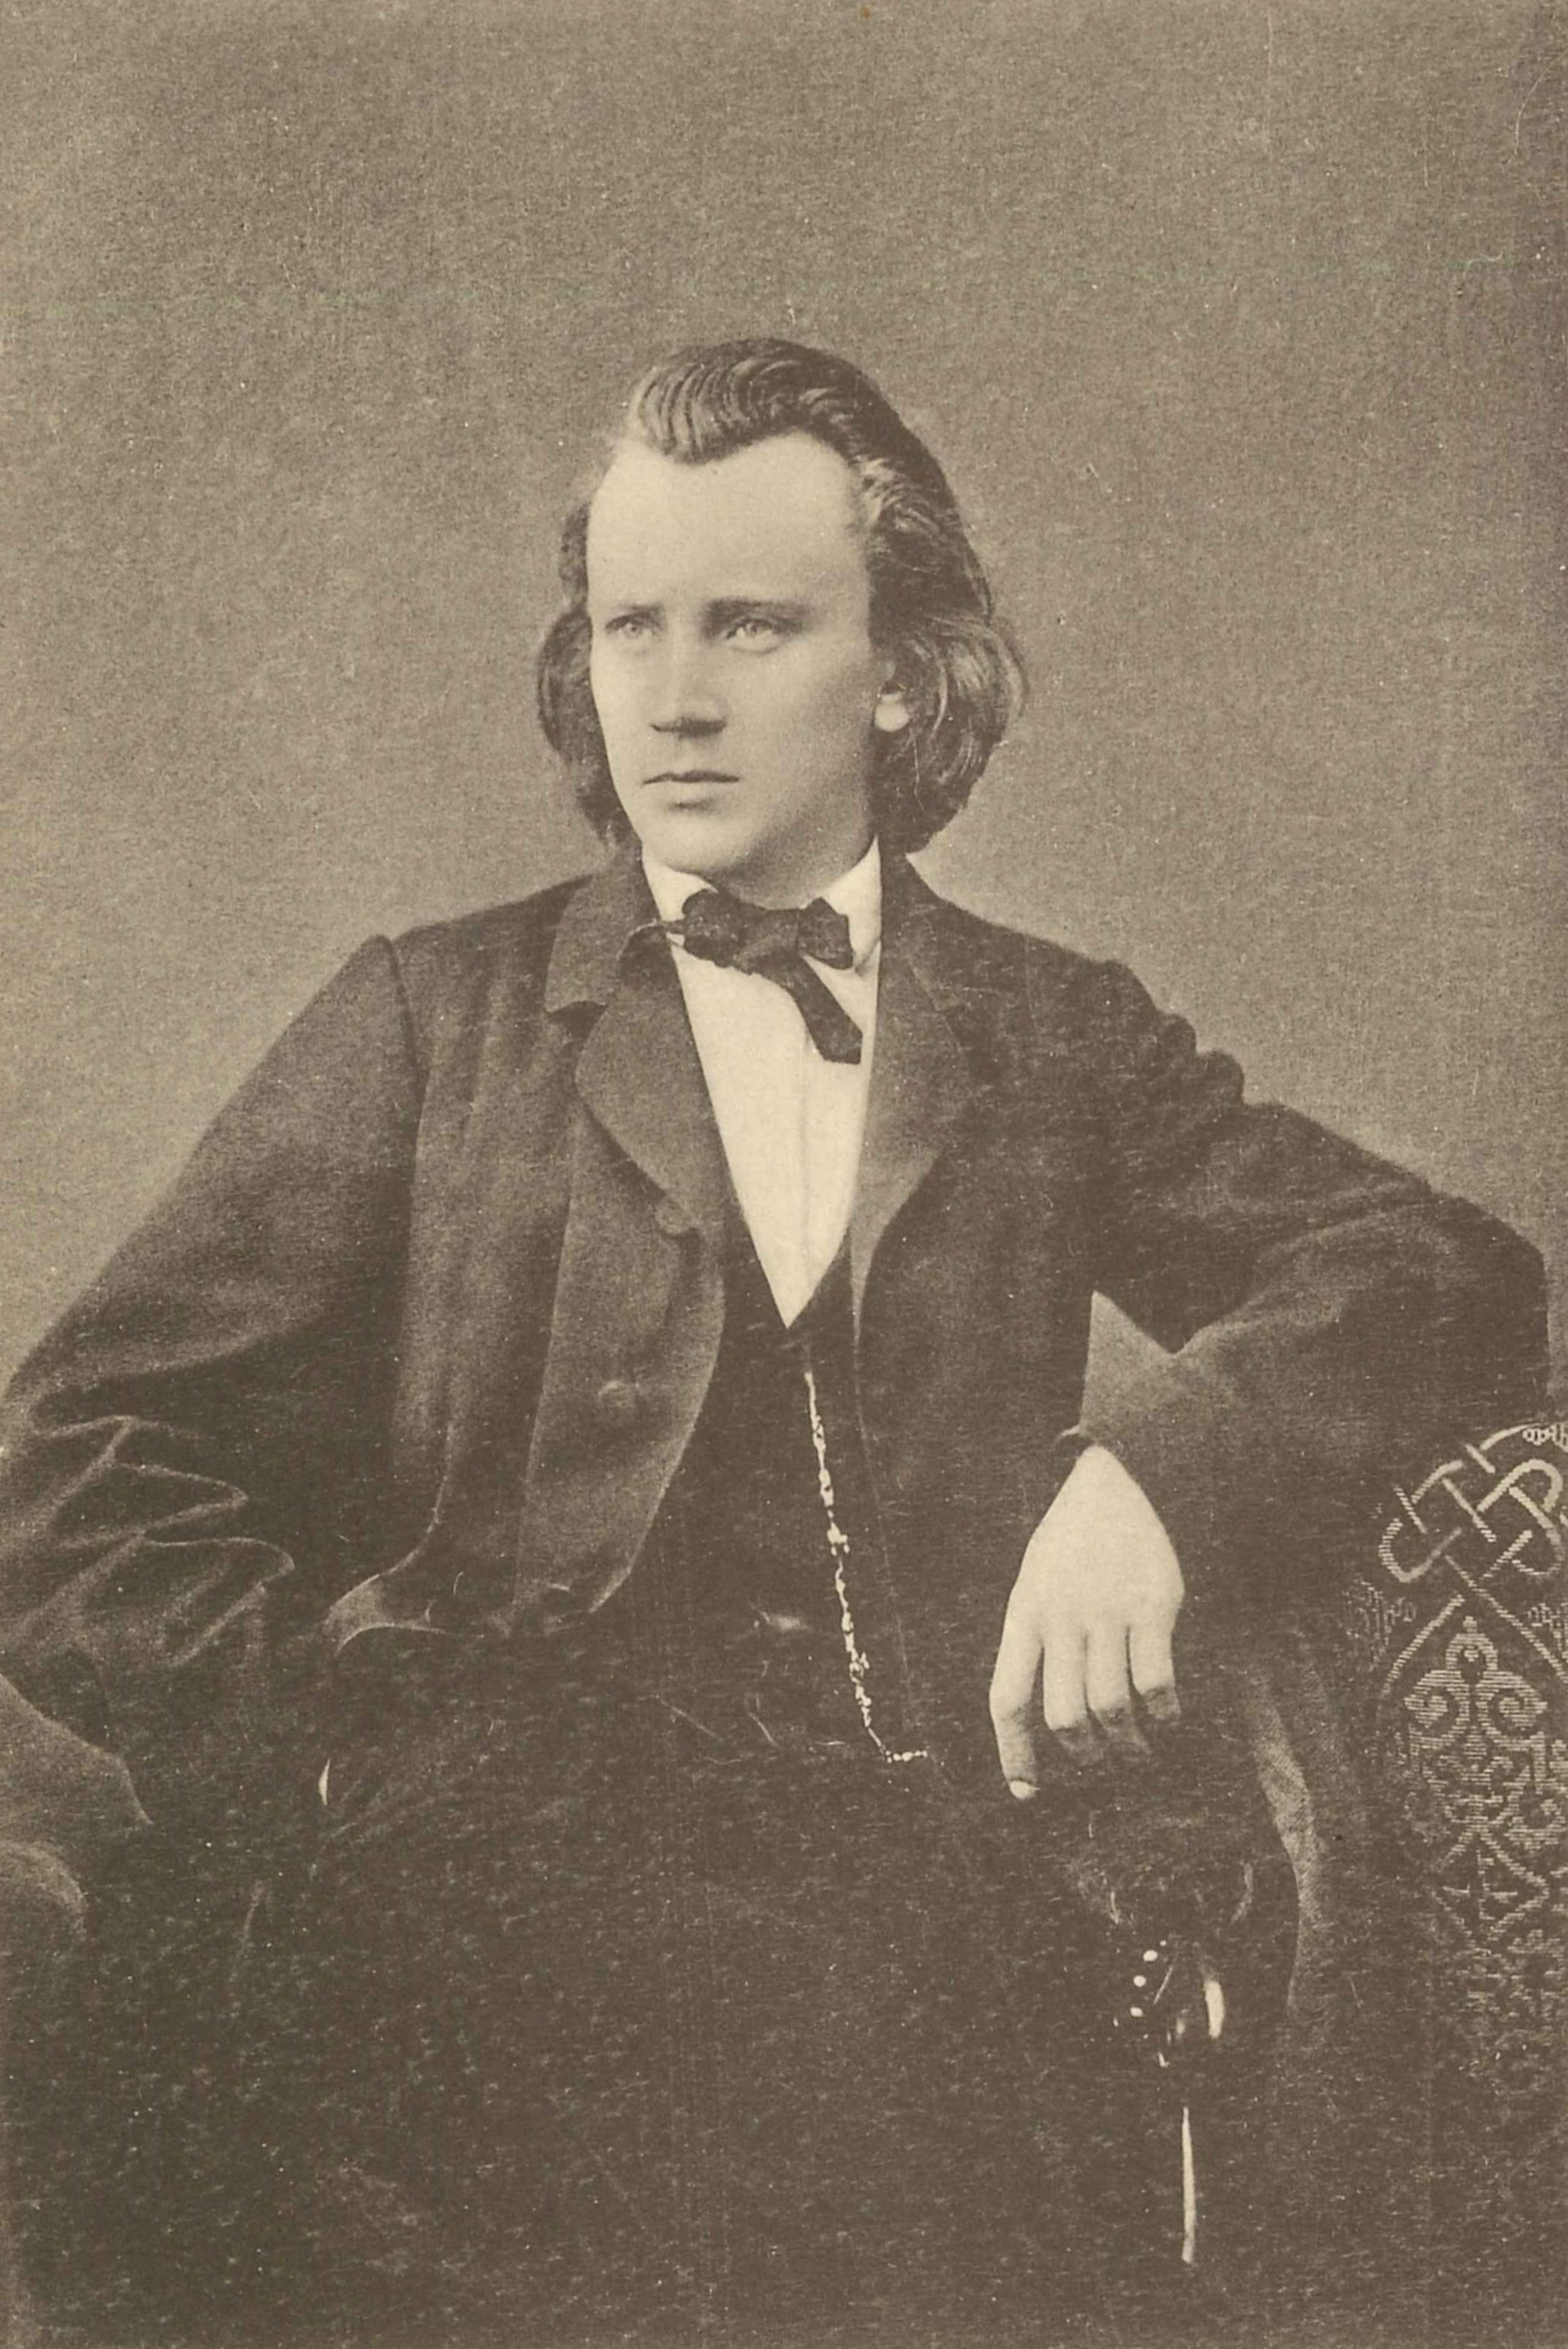 Johannes Brahms in 1865, age 32